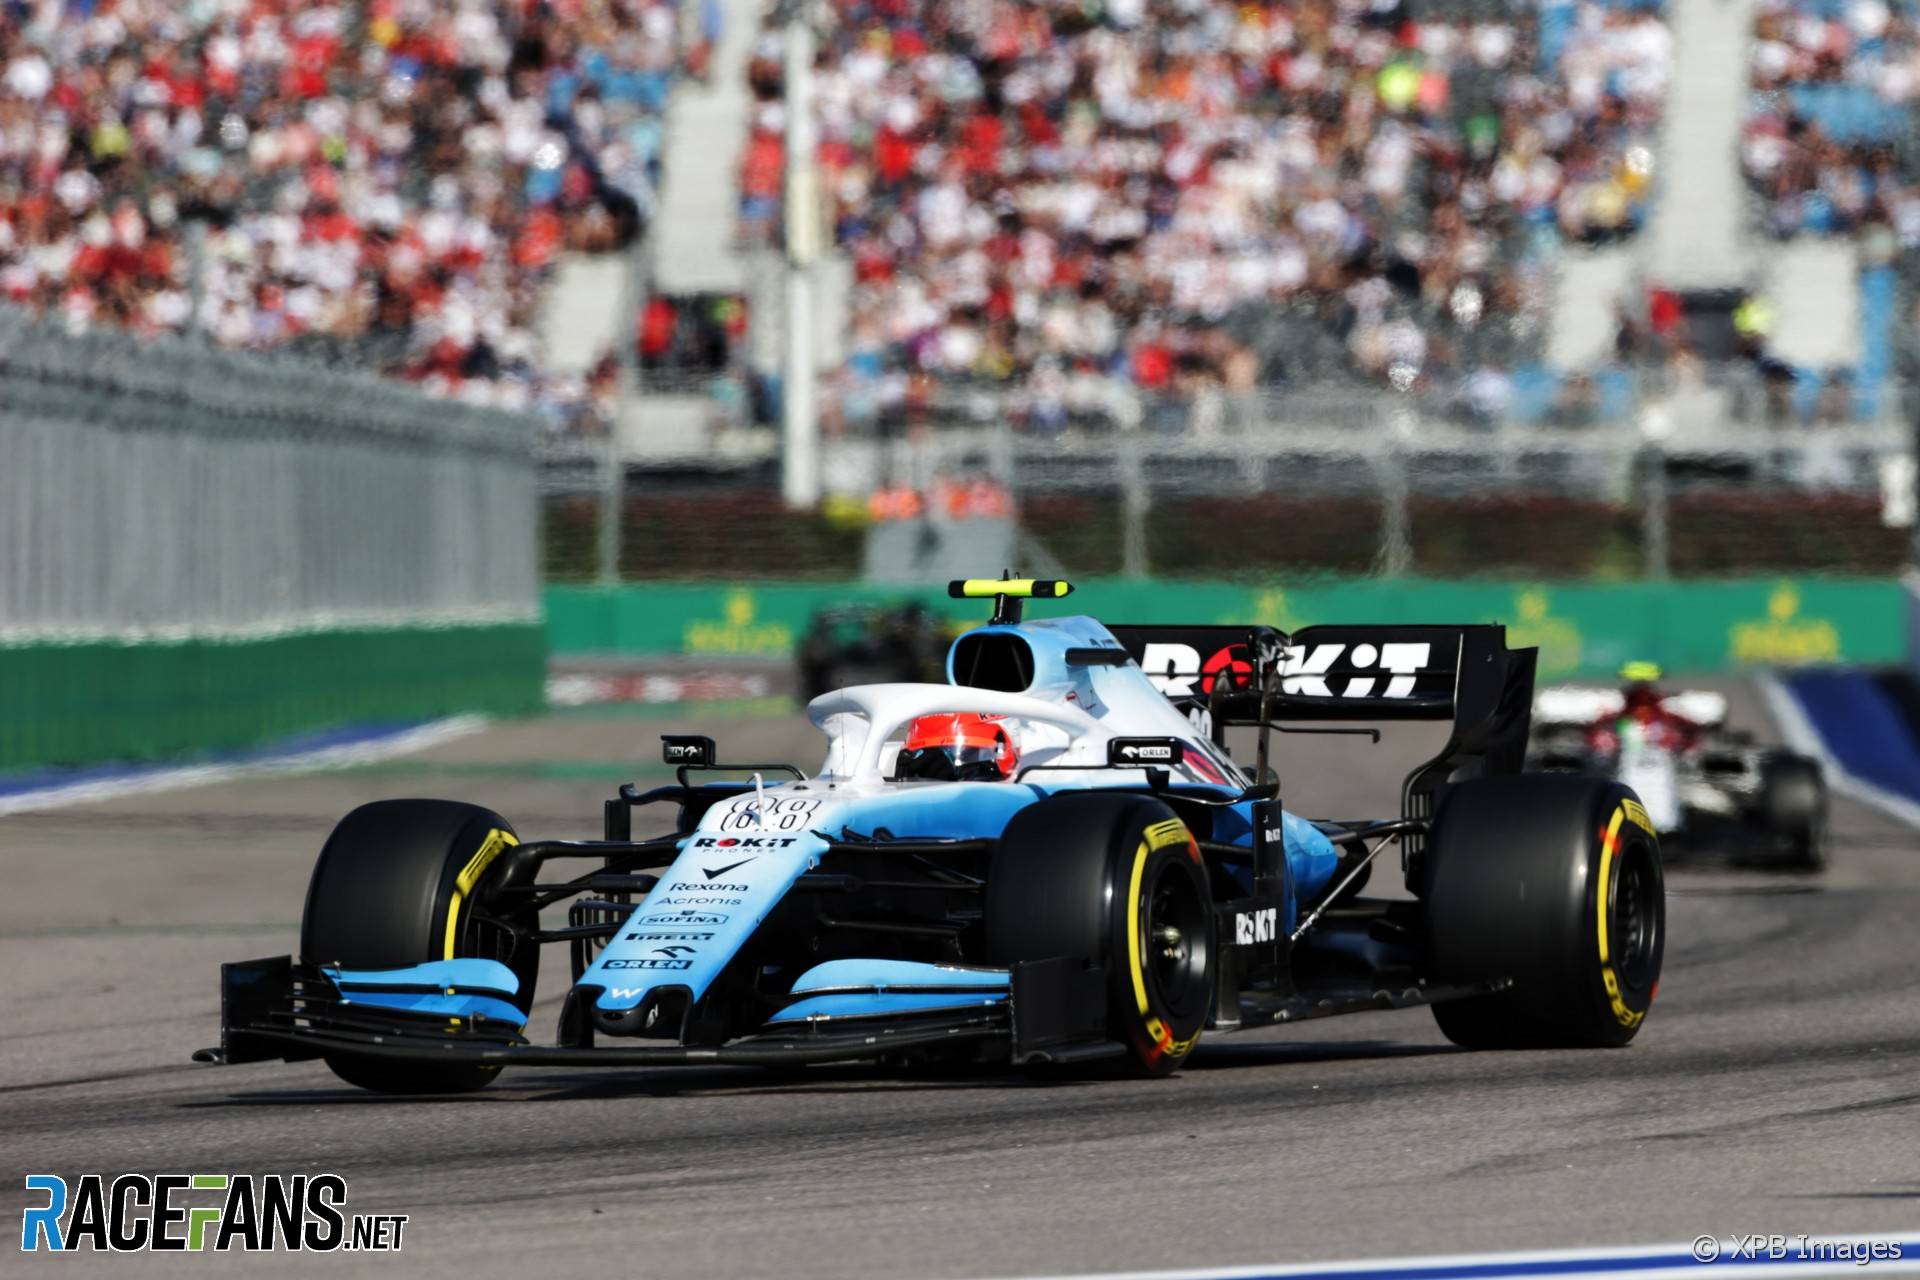 Robert Kubica, Williams, Sochi Autodrom, 2019